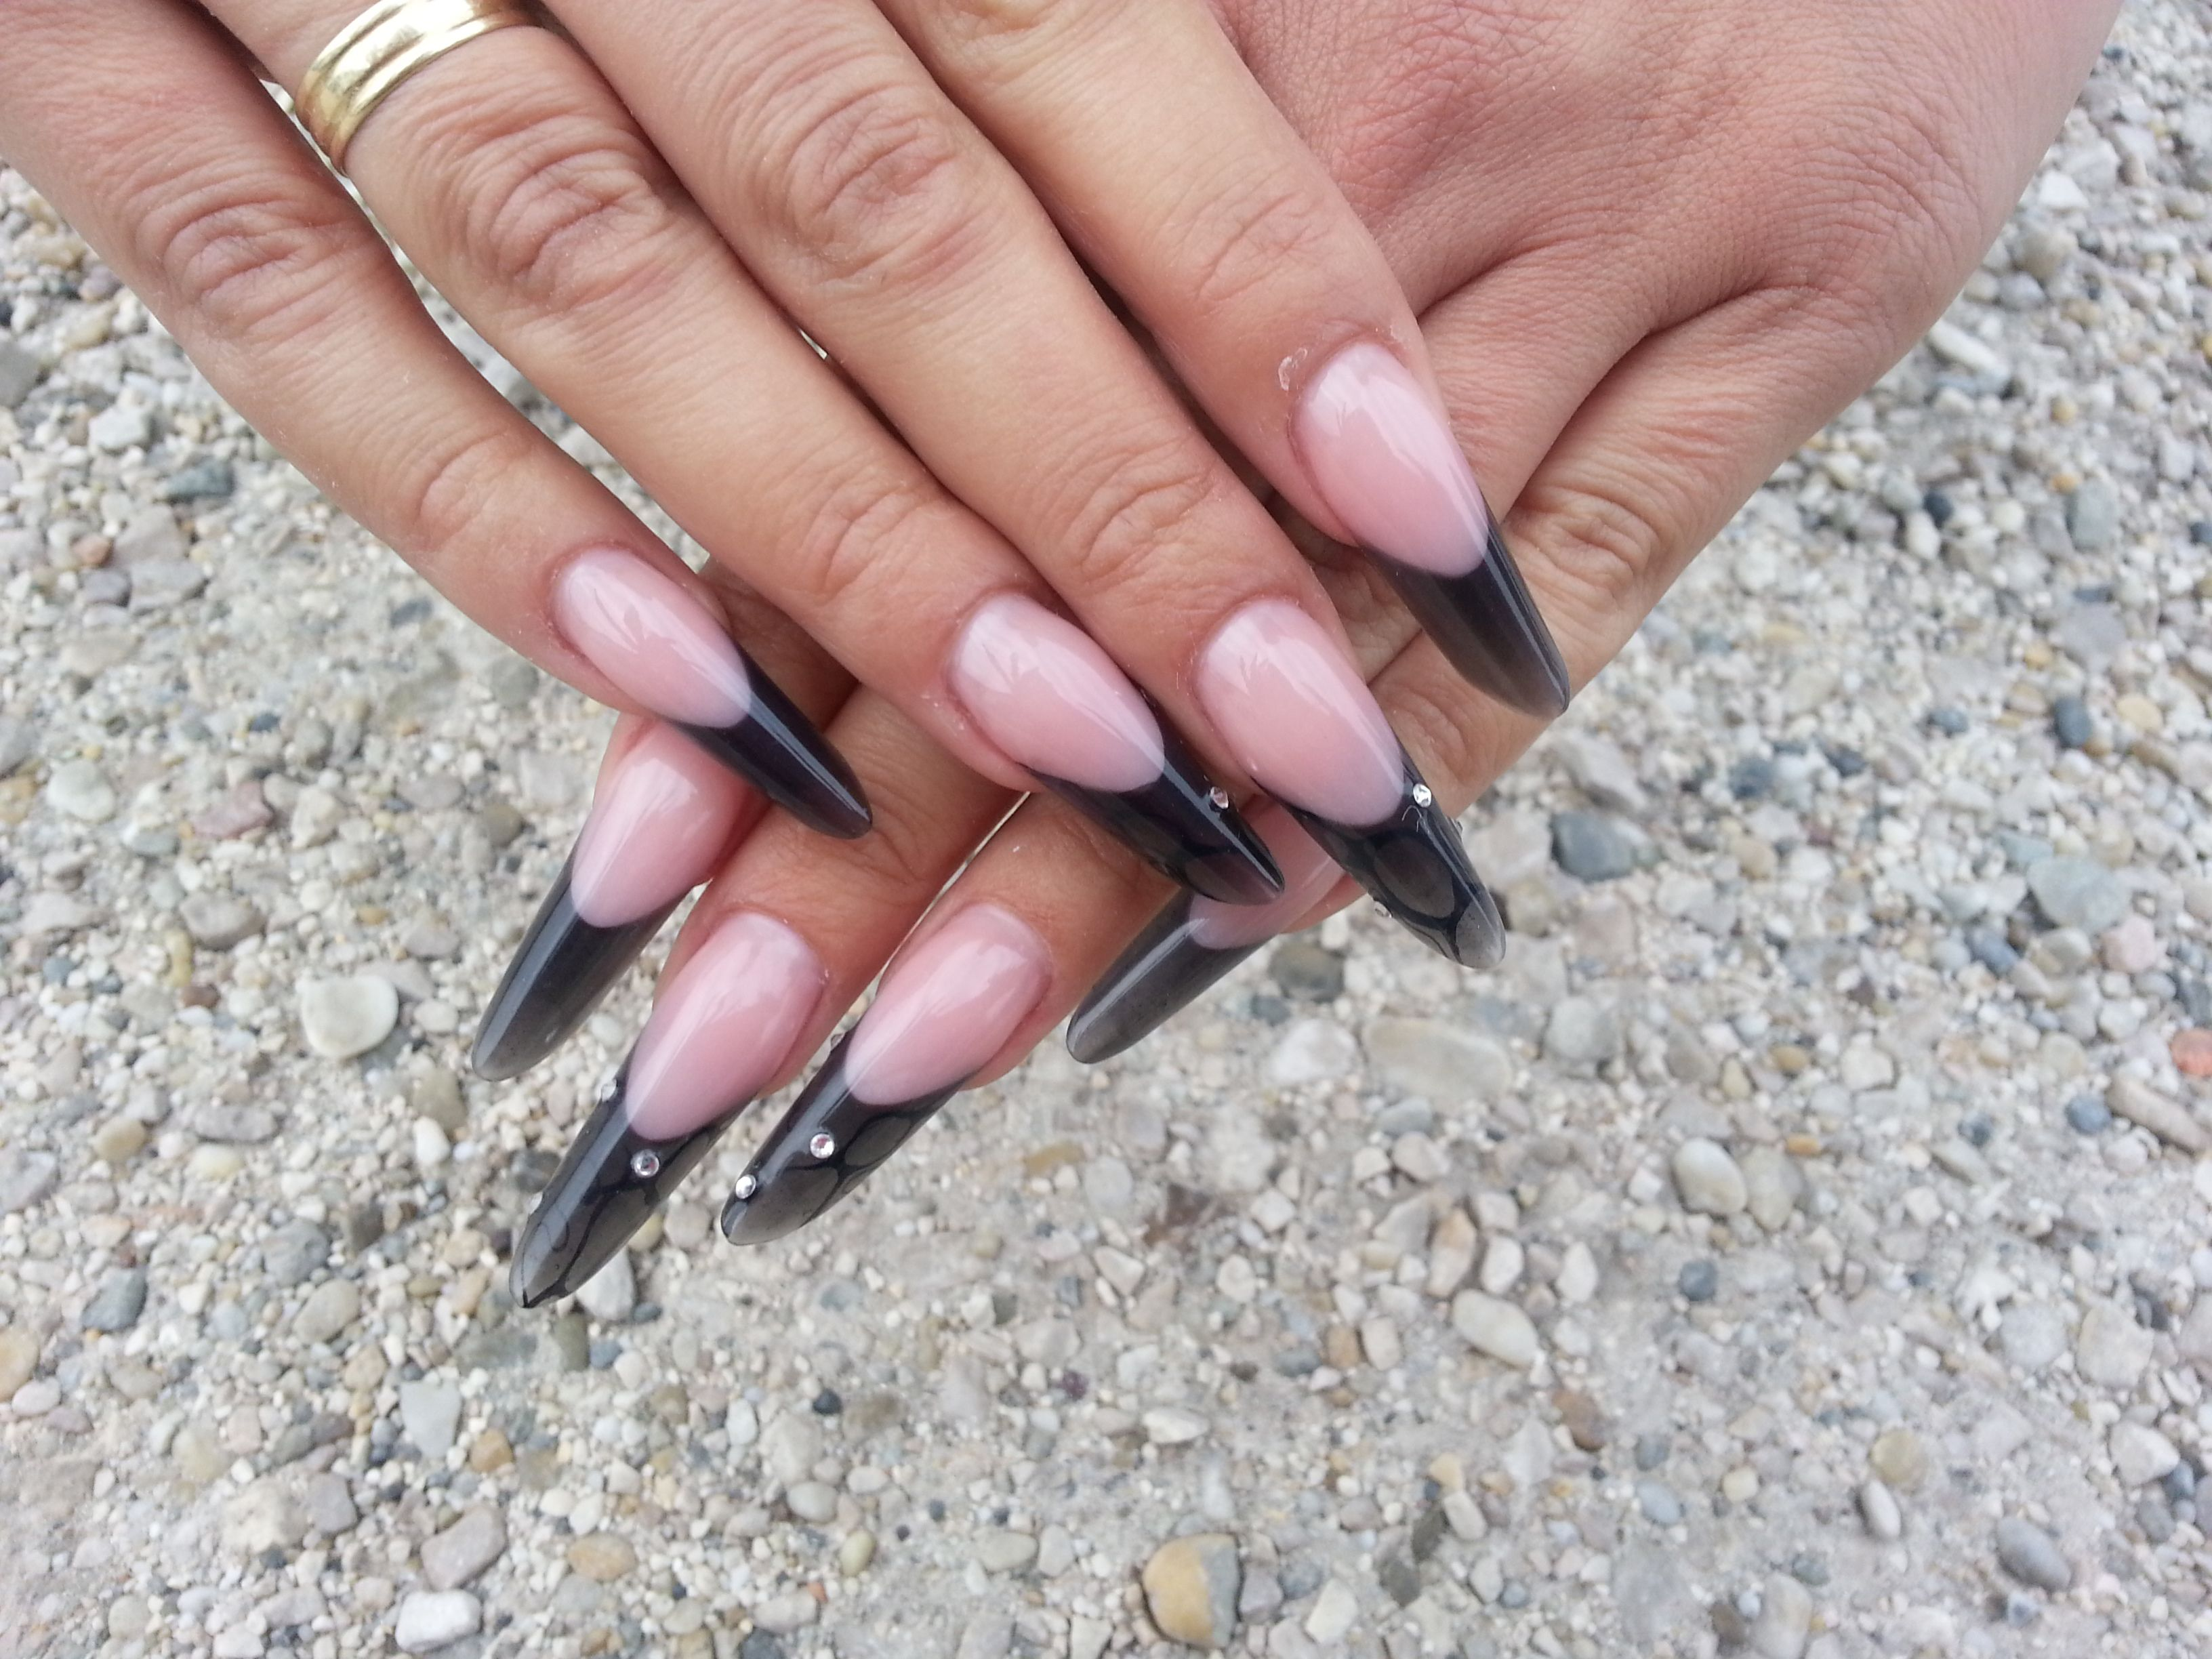 nails #Crystalnails #Nägel #Color Gel #nagelstudio #nailart #Muster ...